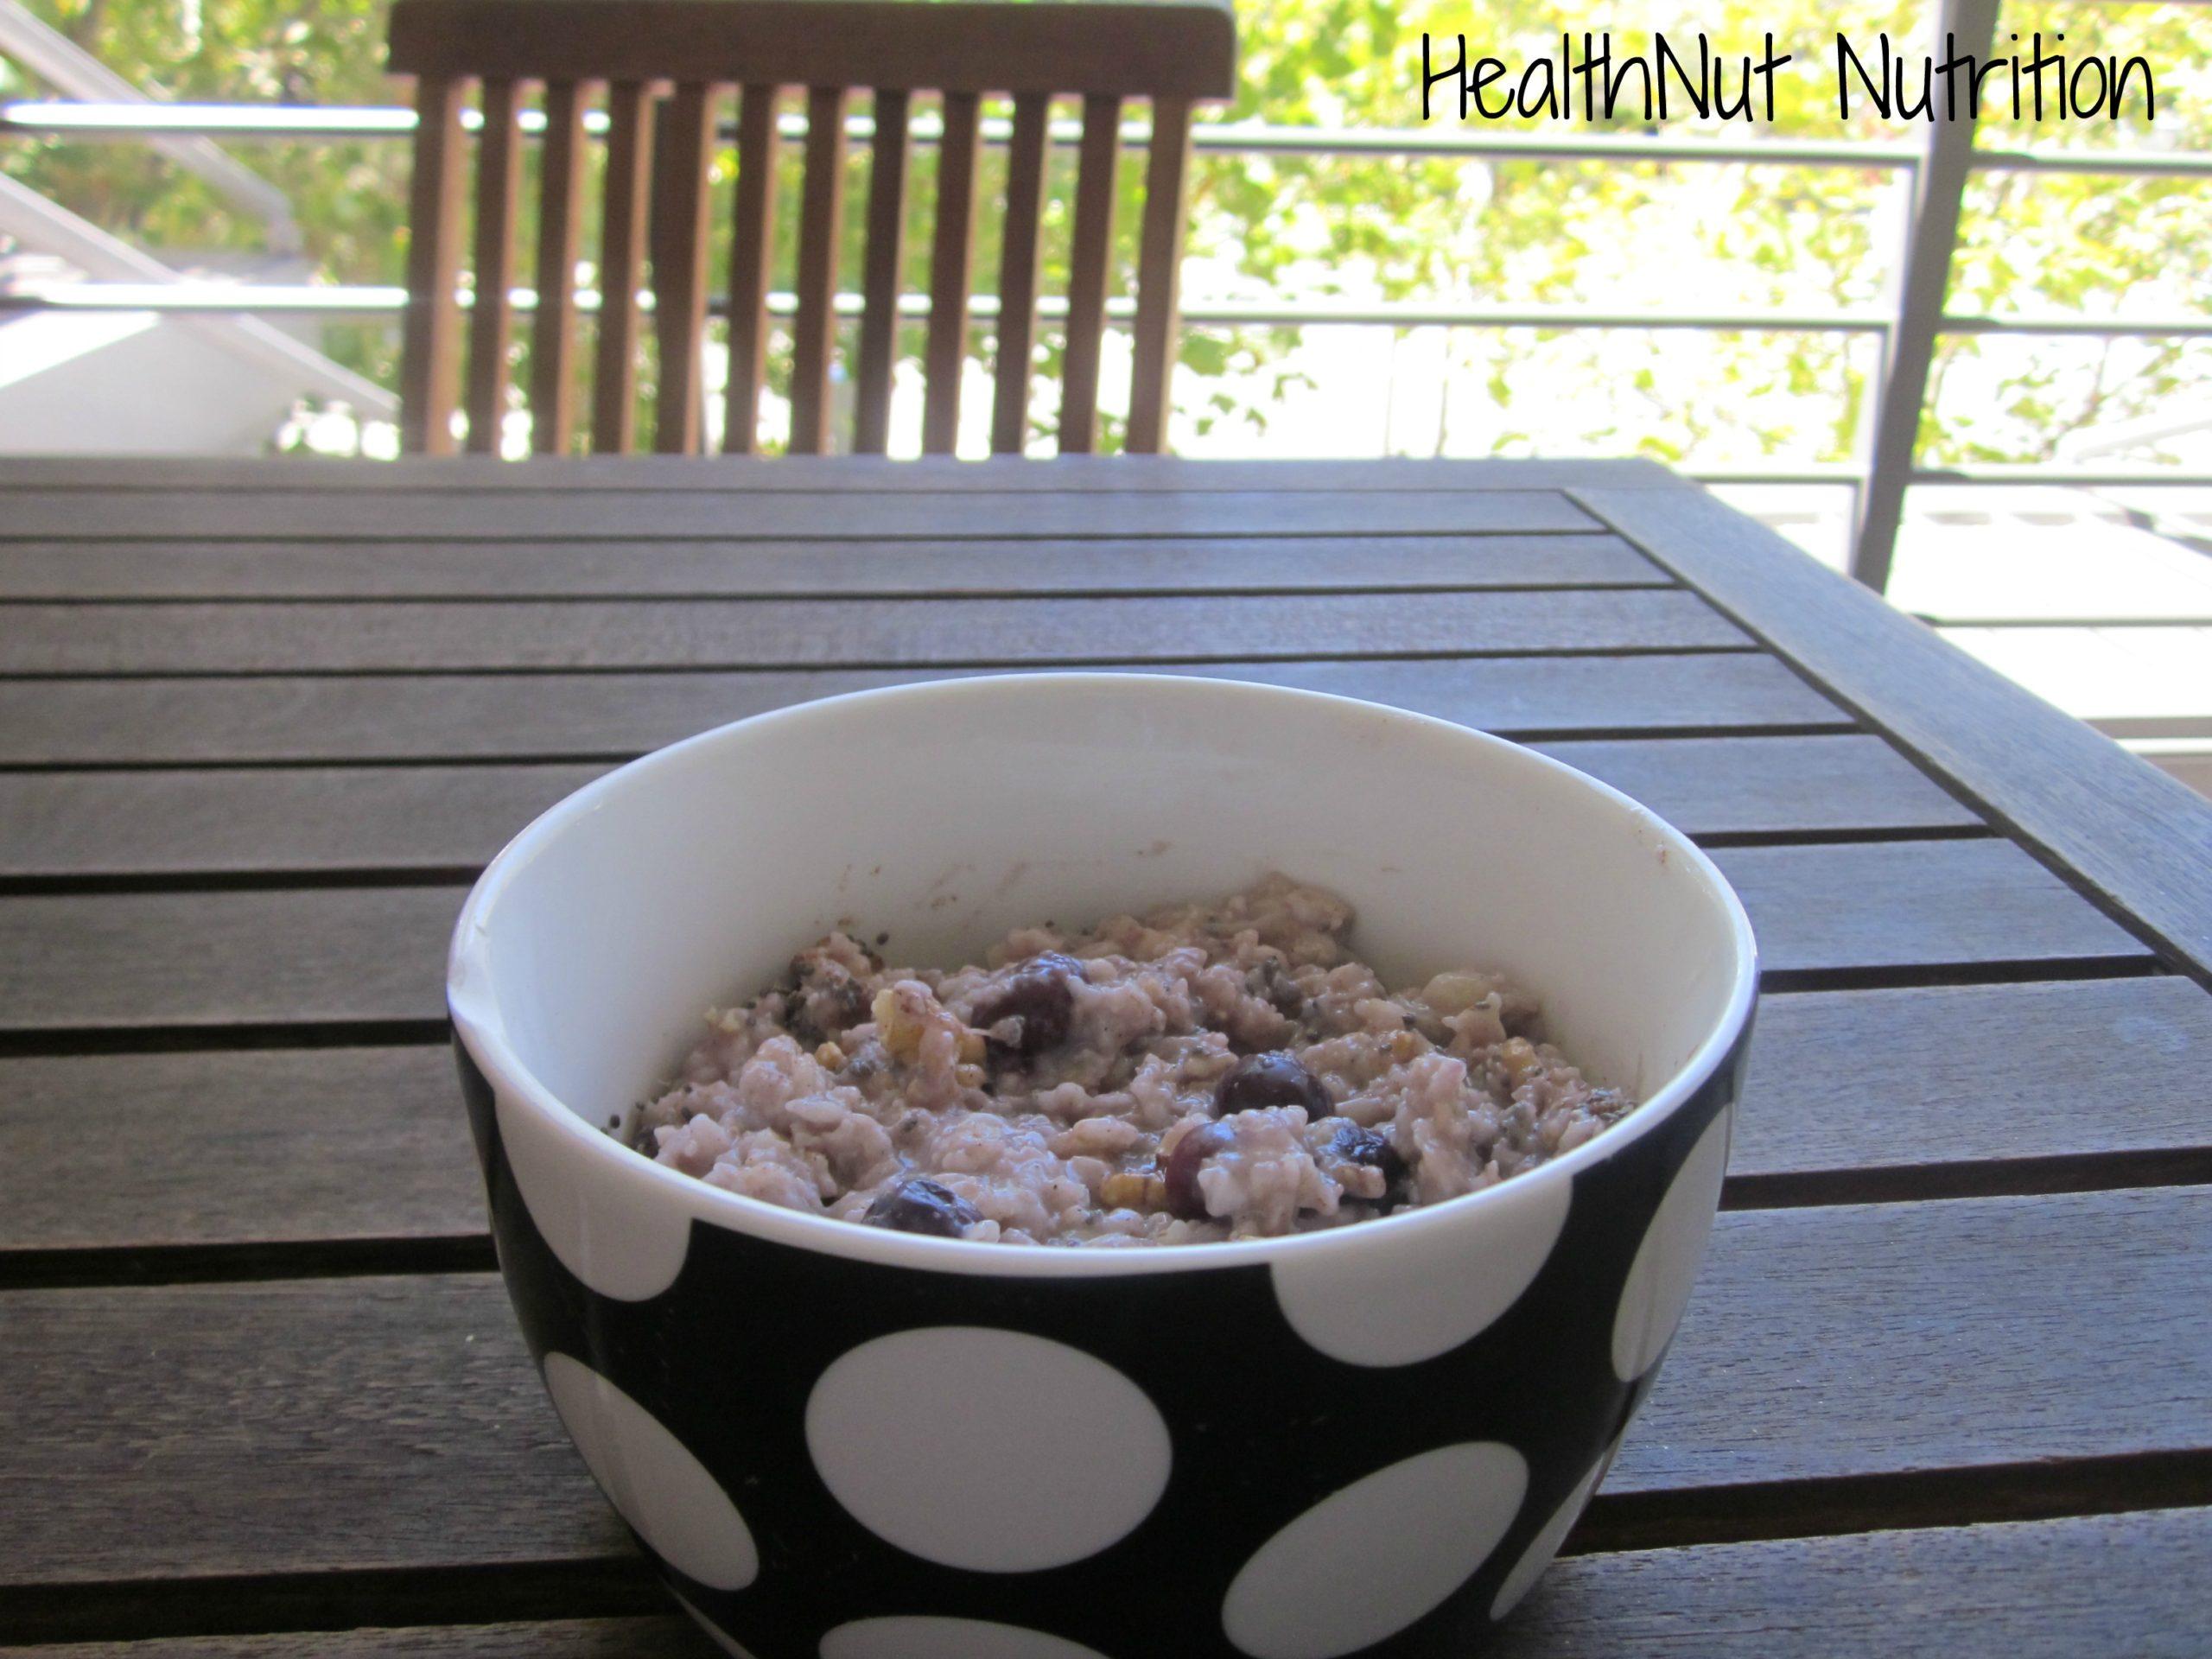 finished oatmeal